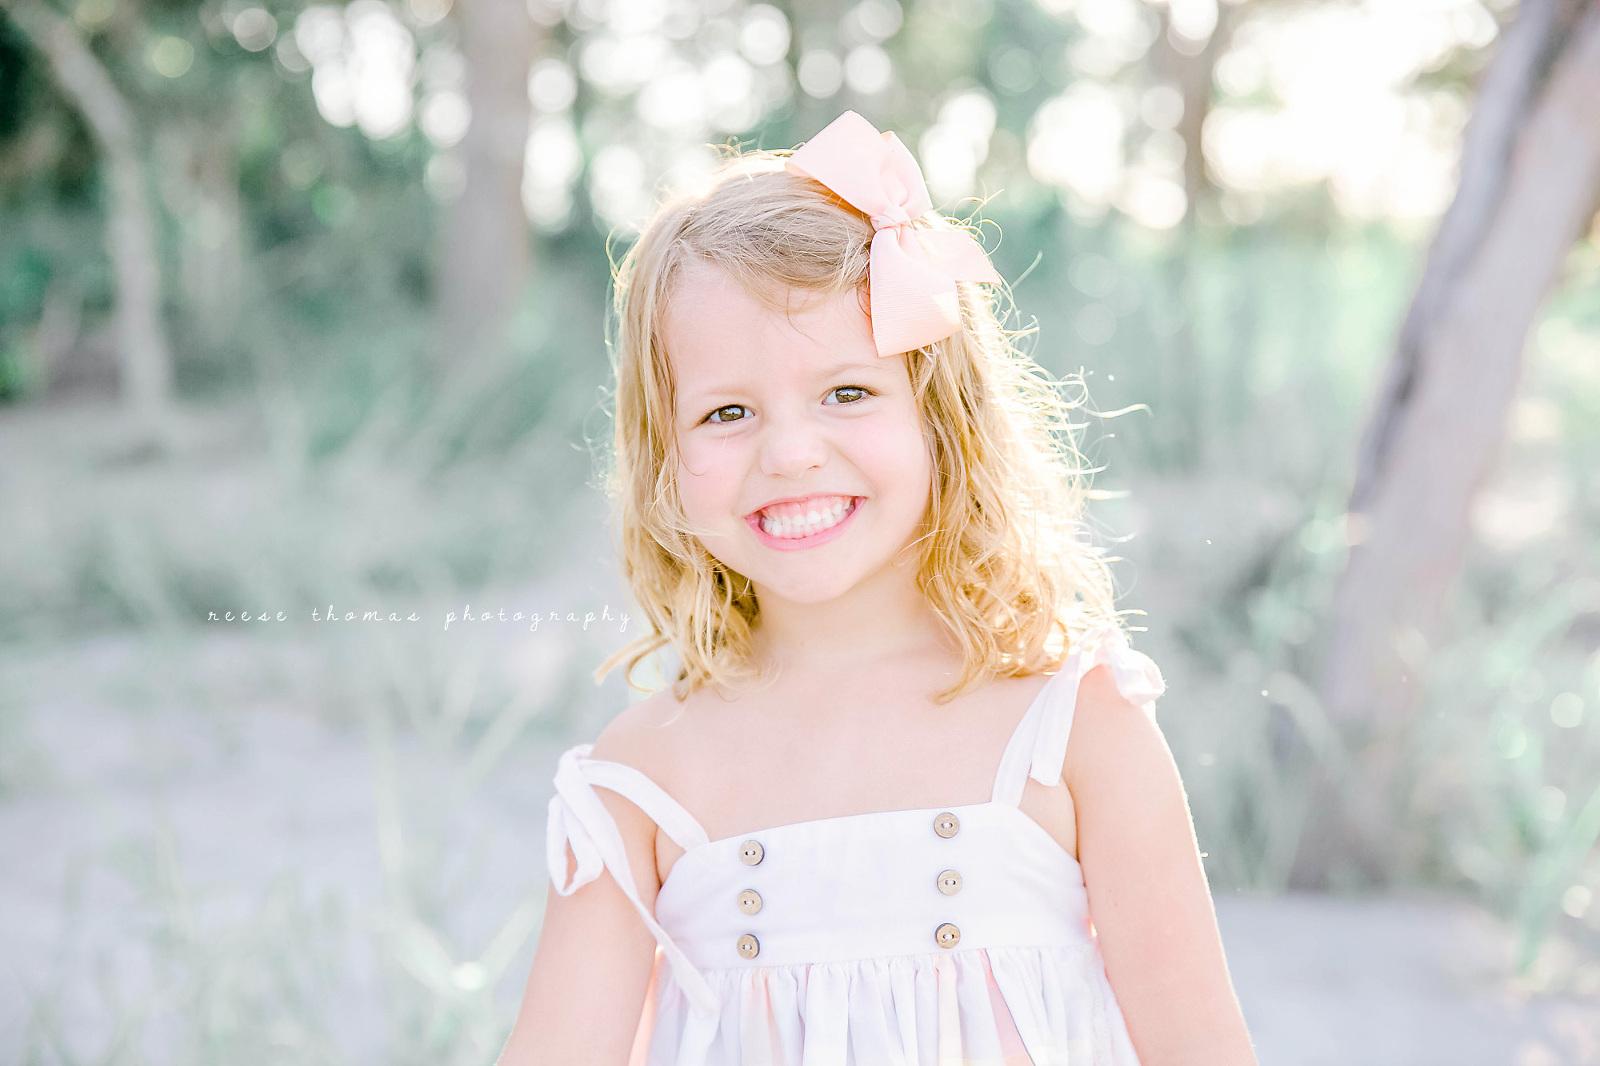 Orange-County-Newborn-Photographer-Colorful-Girl-Portrait